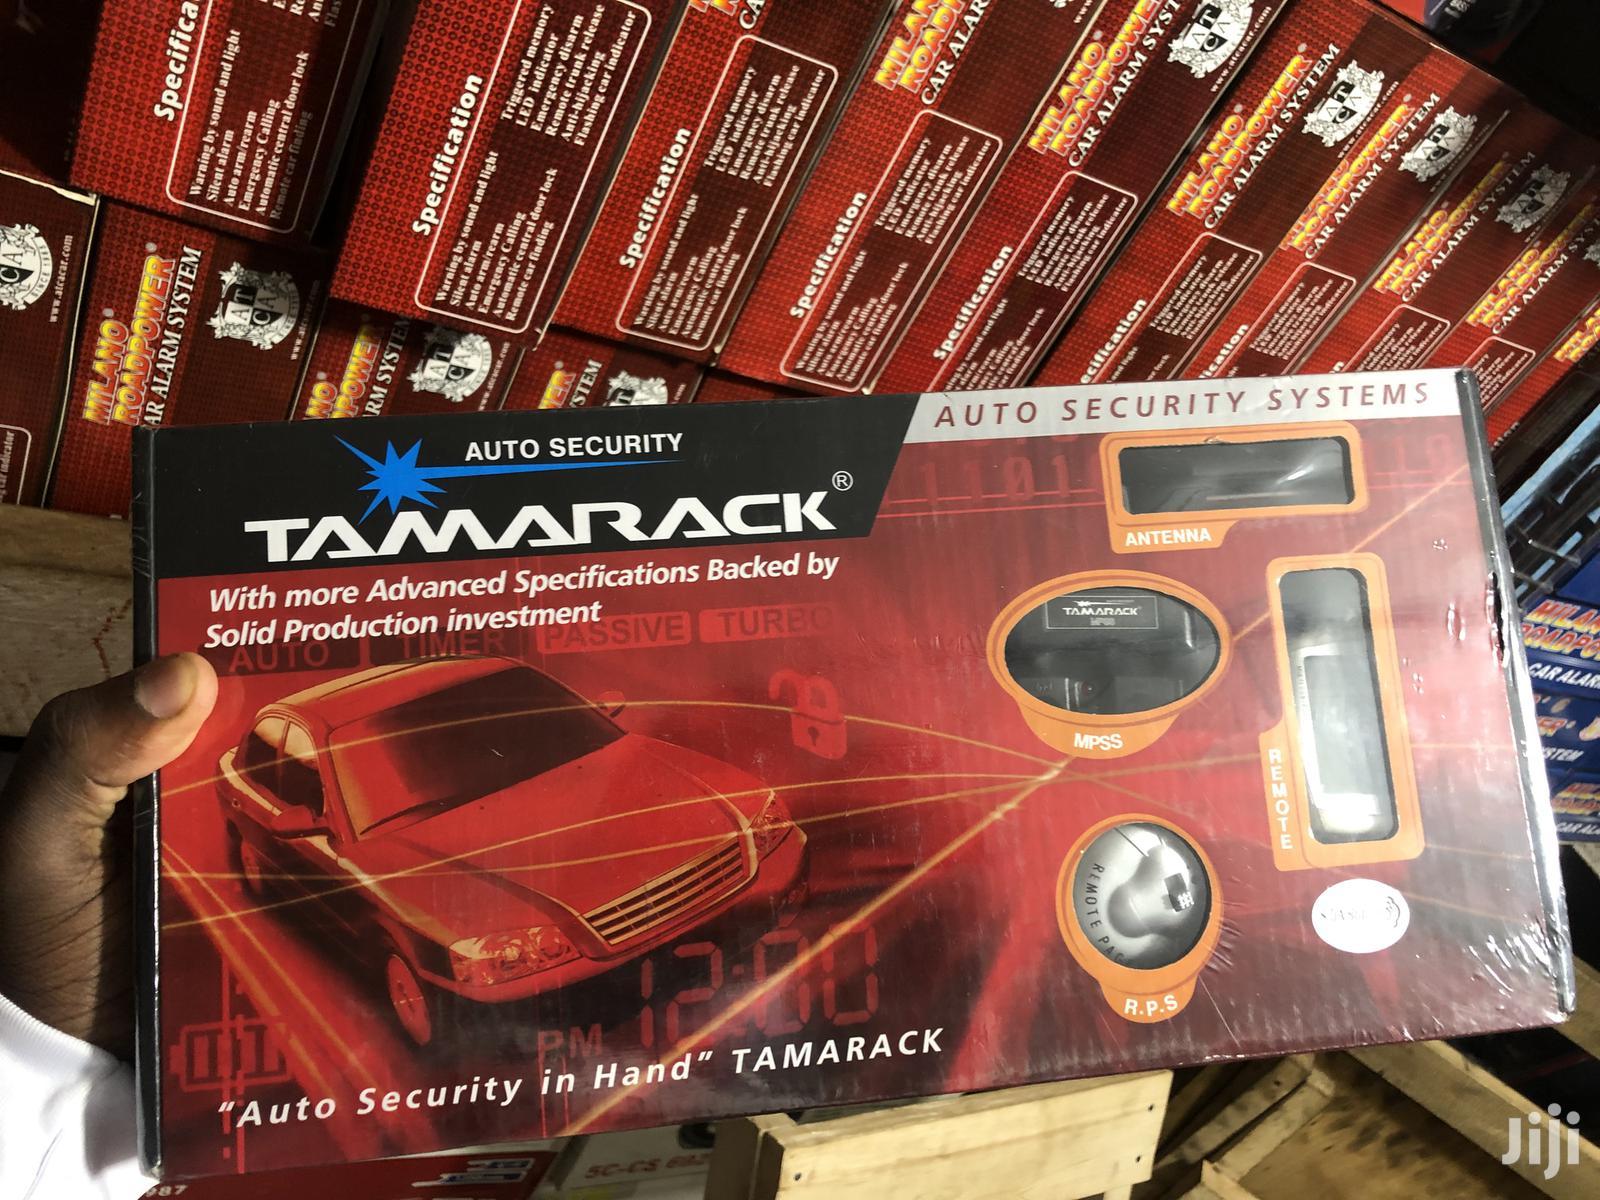 Tamarack Engine Starter Car Alarm System